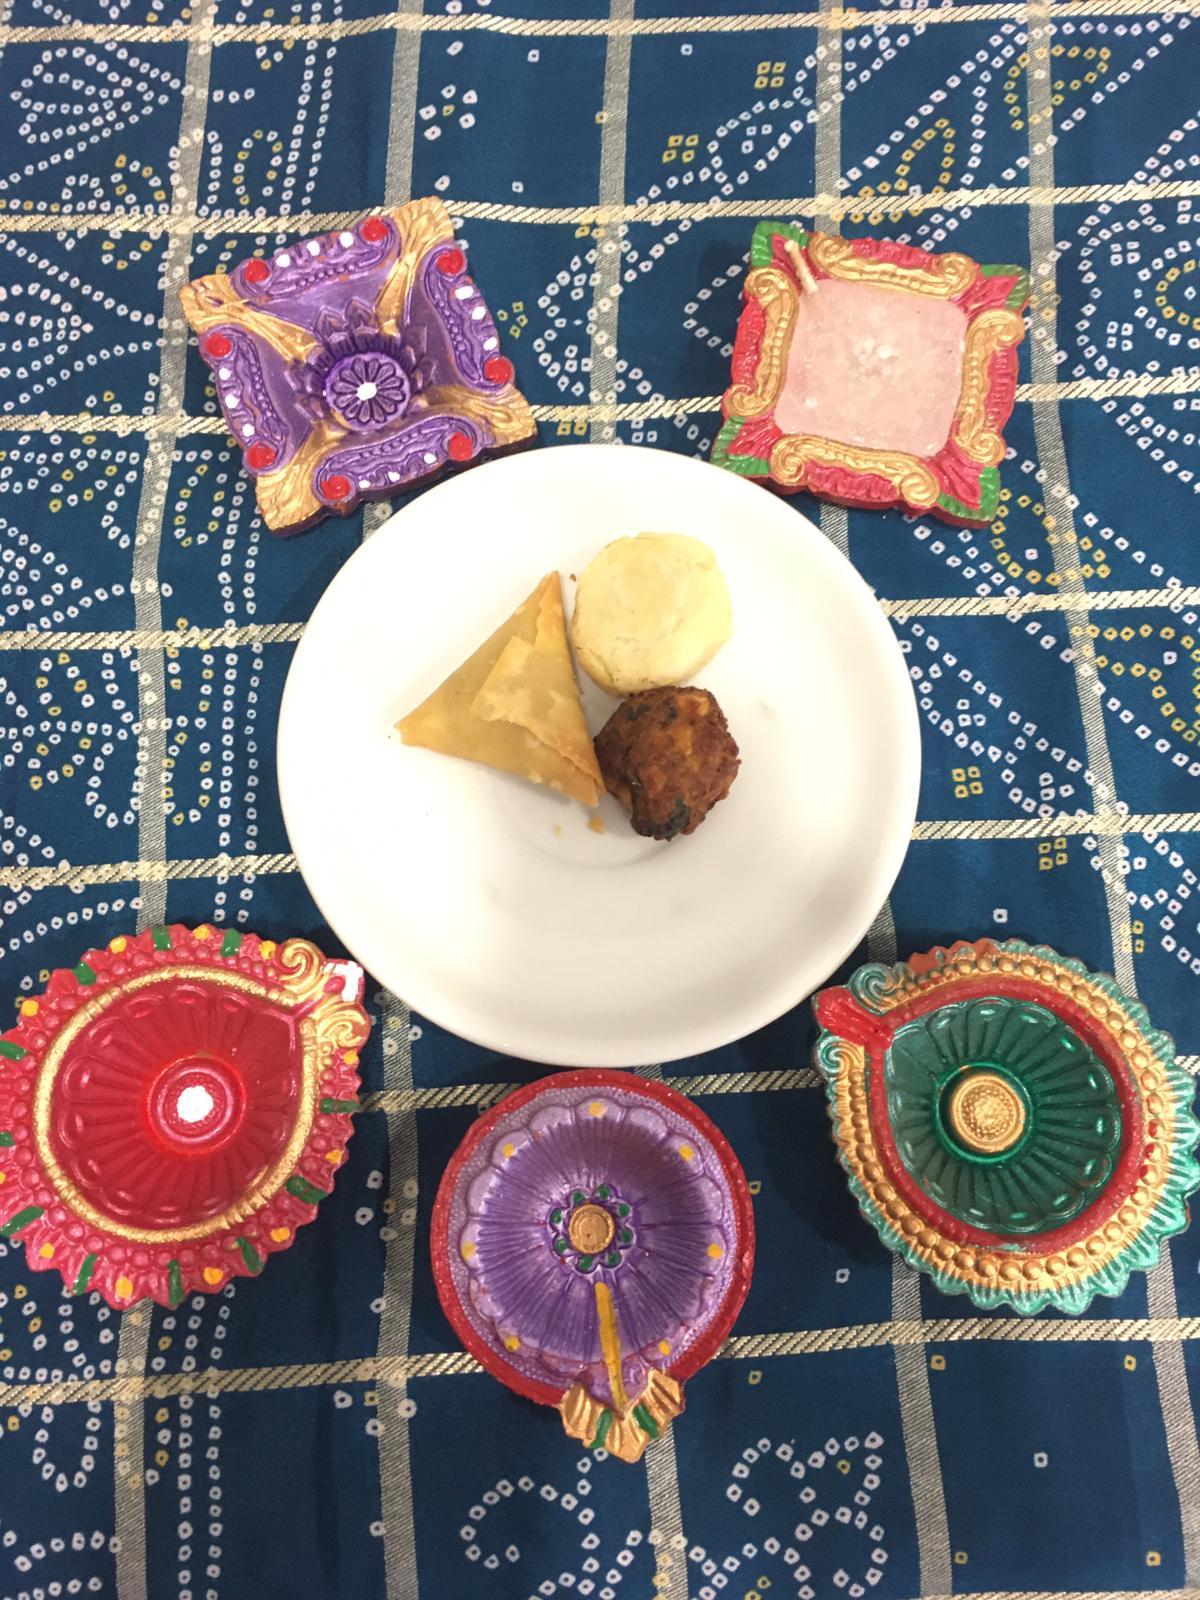 Northampton Care Home Celebrates Diwali